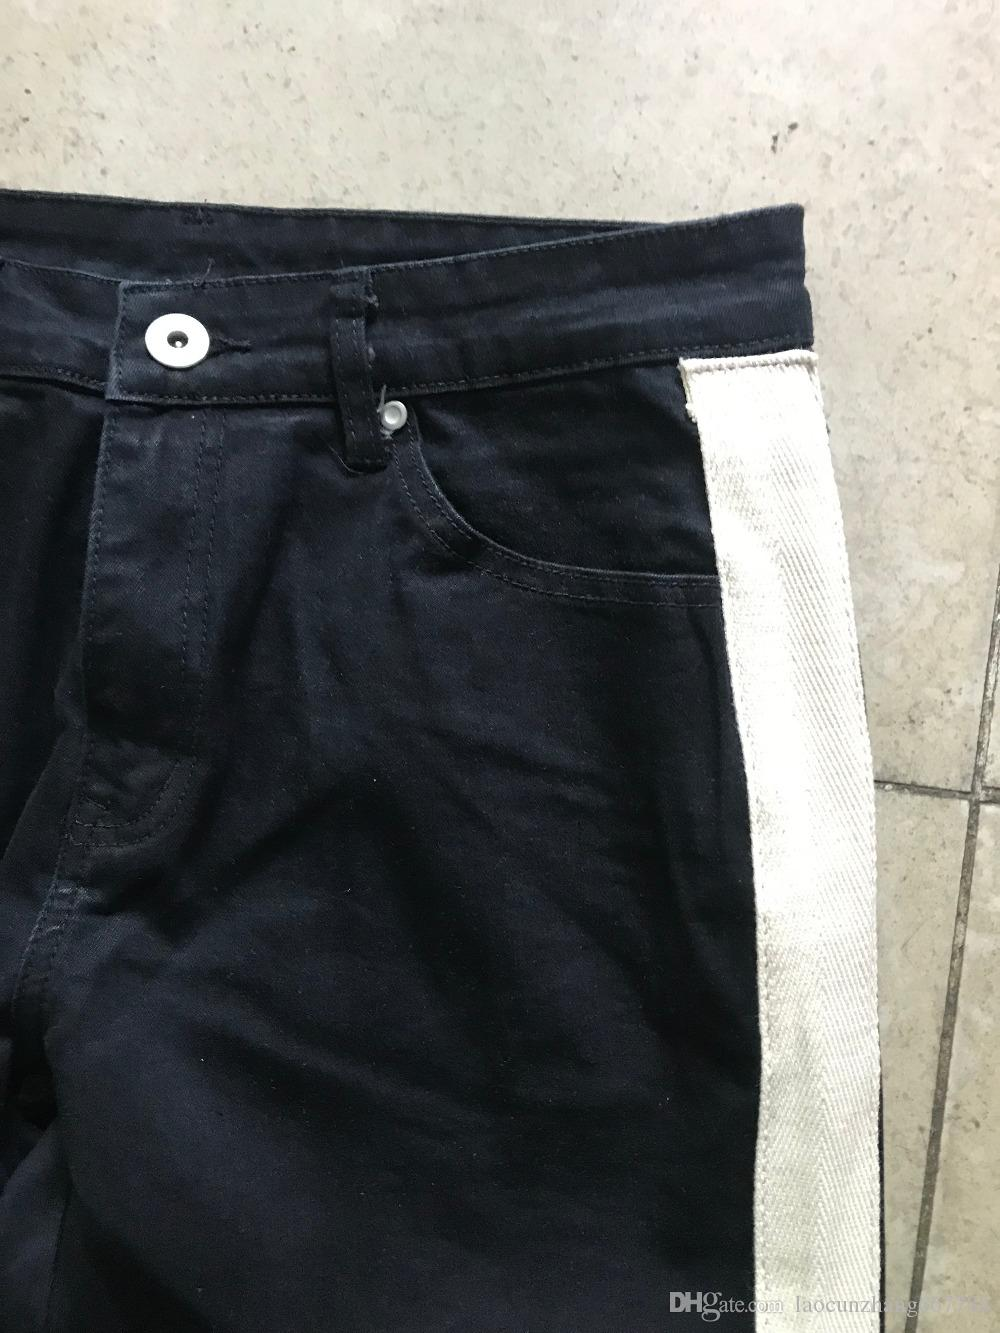 2018 Best version RETRO DENIM - jeans azul marino negros Side Stripe White raya costura Hip Hop Casual Streetwear jeans